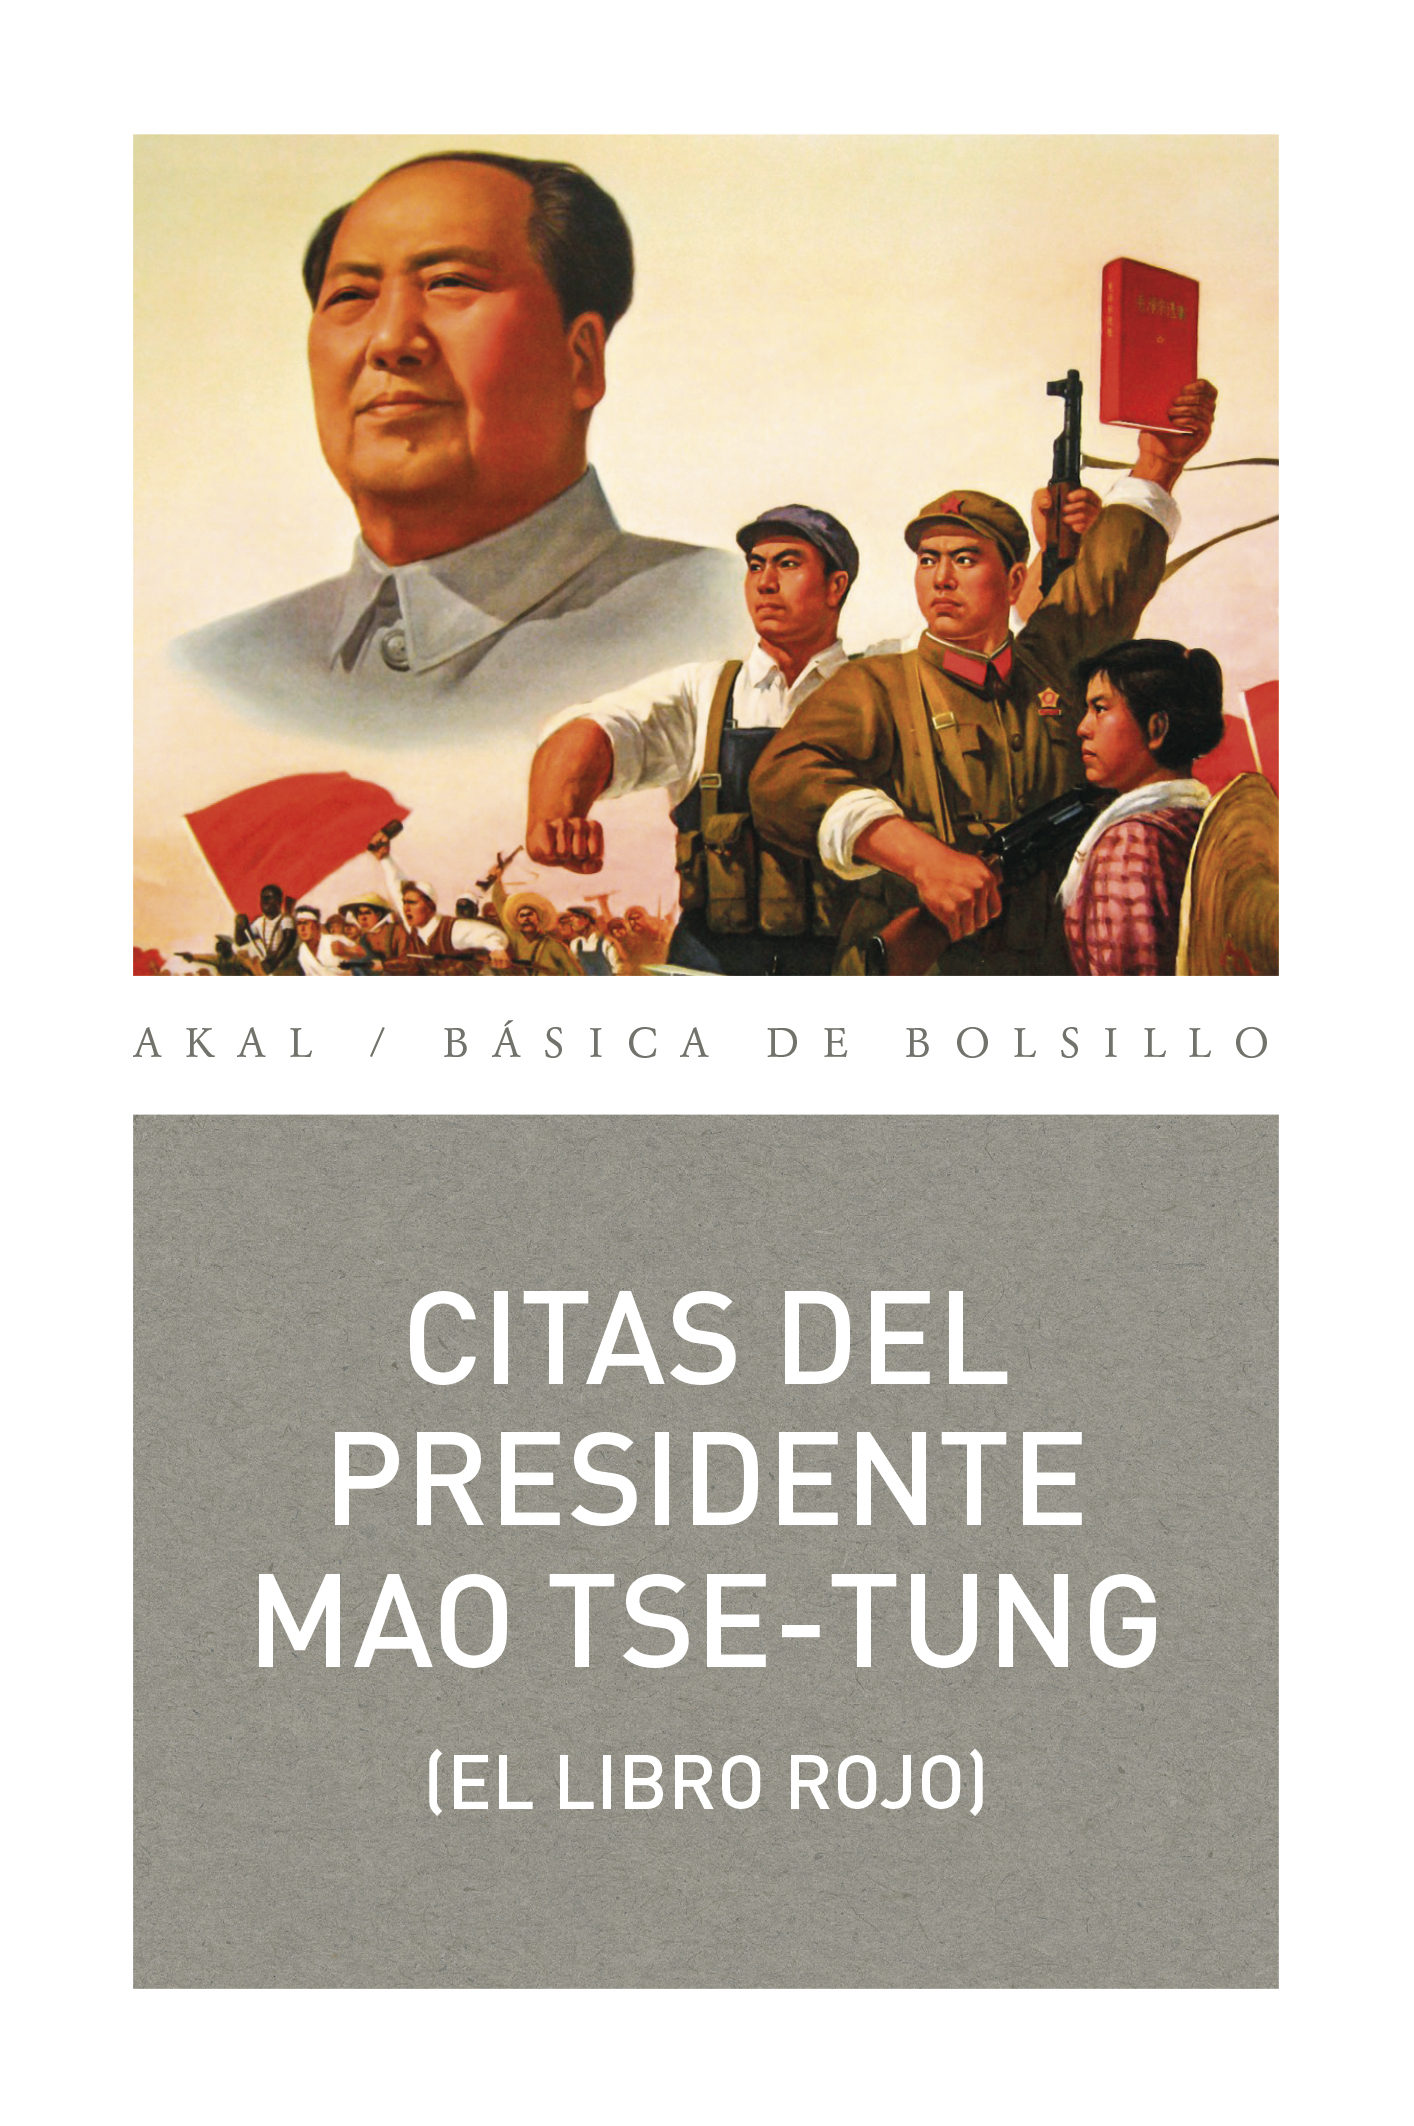 Citas Del Presidente Mao Tse-tung: (el Libro Rojo) por Mao Tse-tung